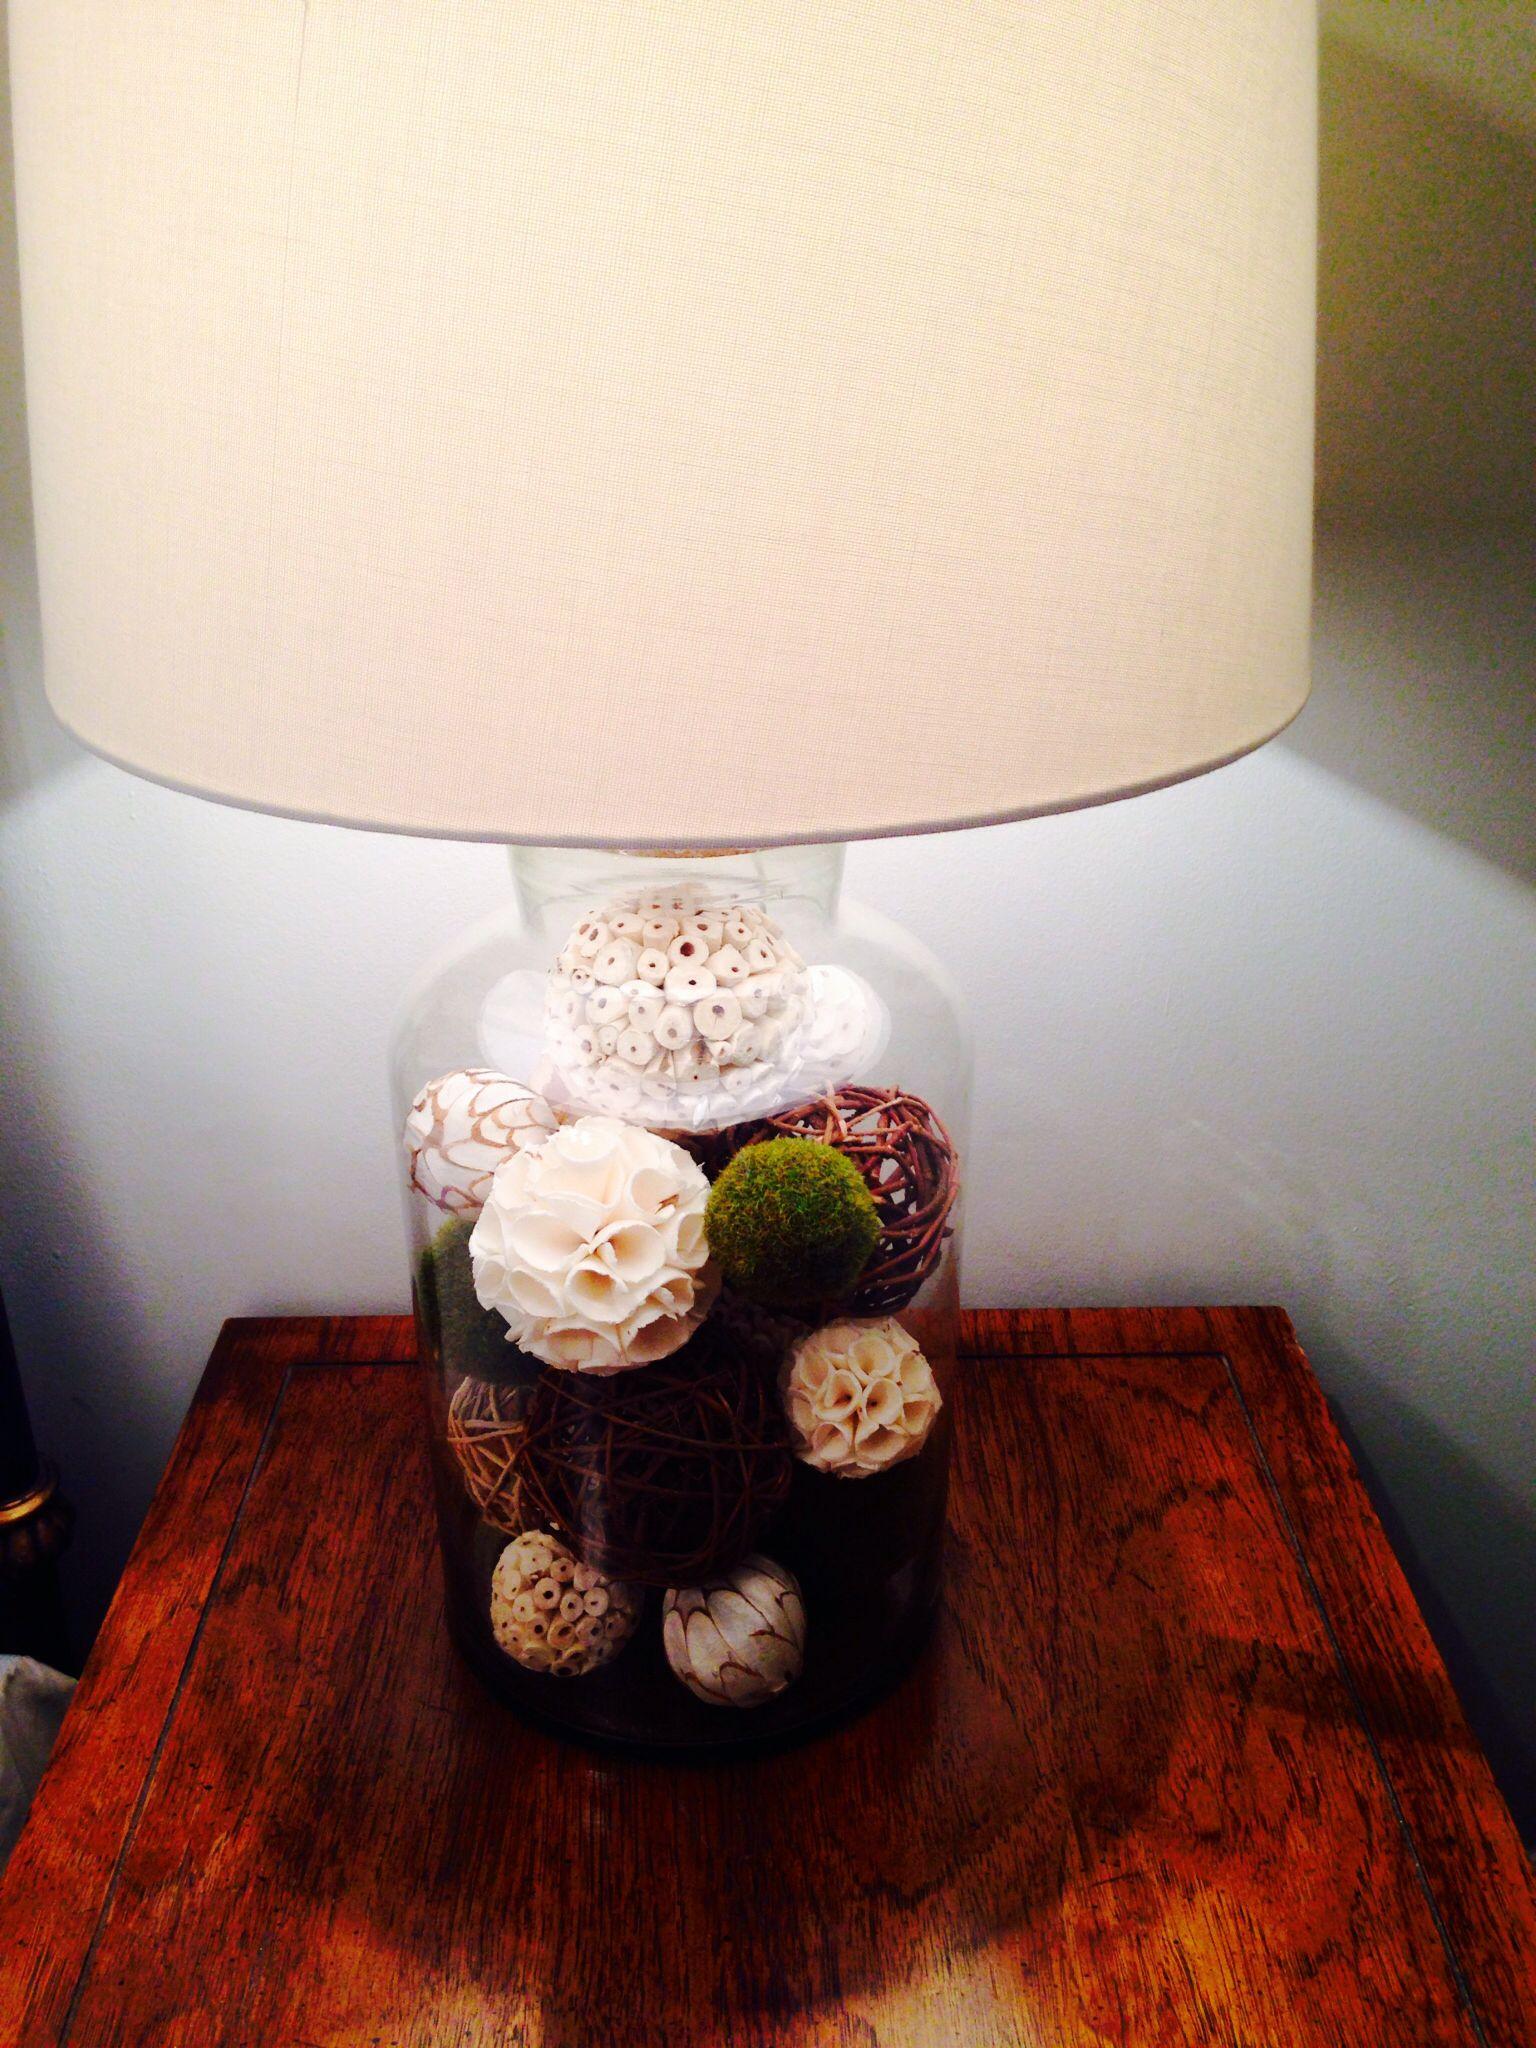 diy lamp base ideas on fillable lamps genius from home goods glass lamp base fillable lamp lamp glass lamp base fillable lamp